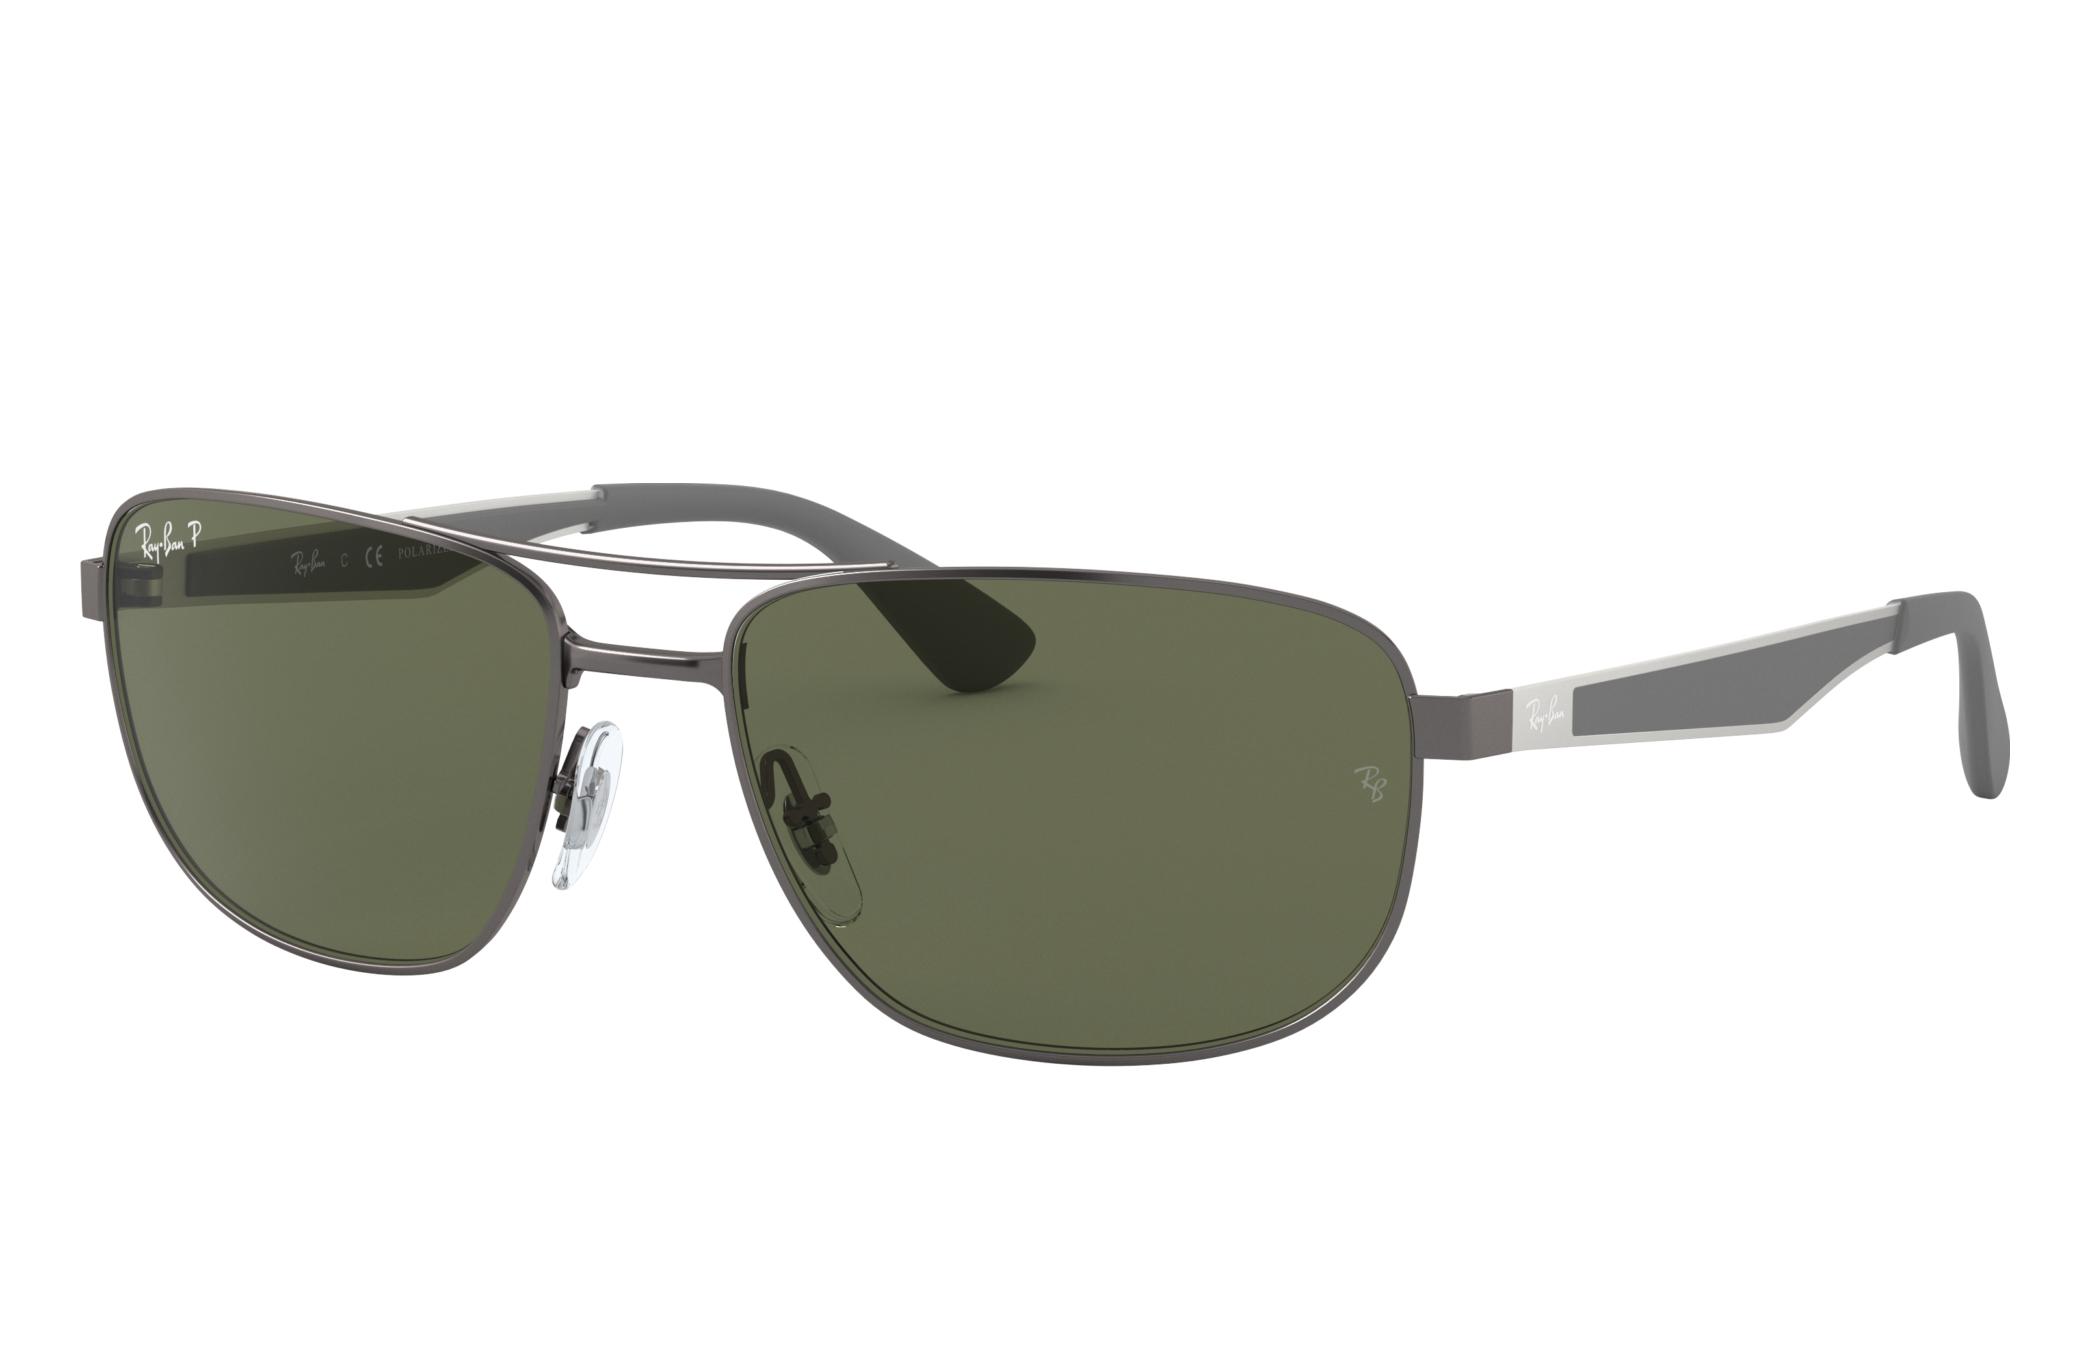 Ray-Ban Rb3528 Gunmetal, Polarized Green Lenses - RB3528